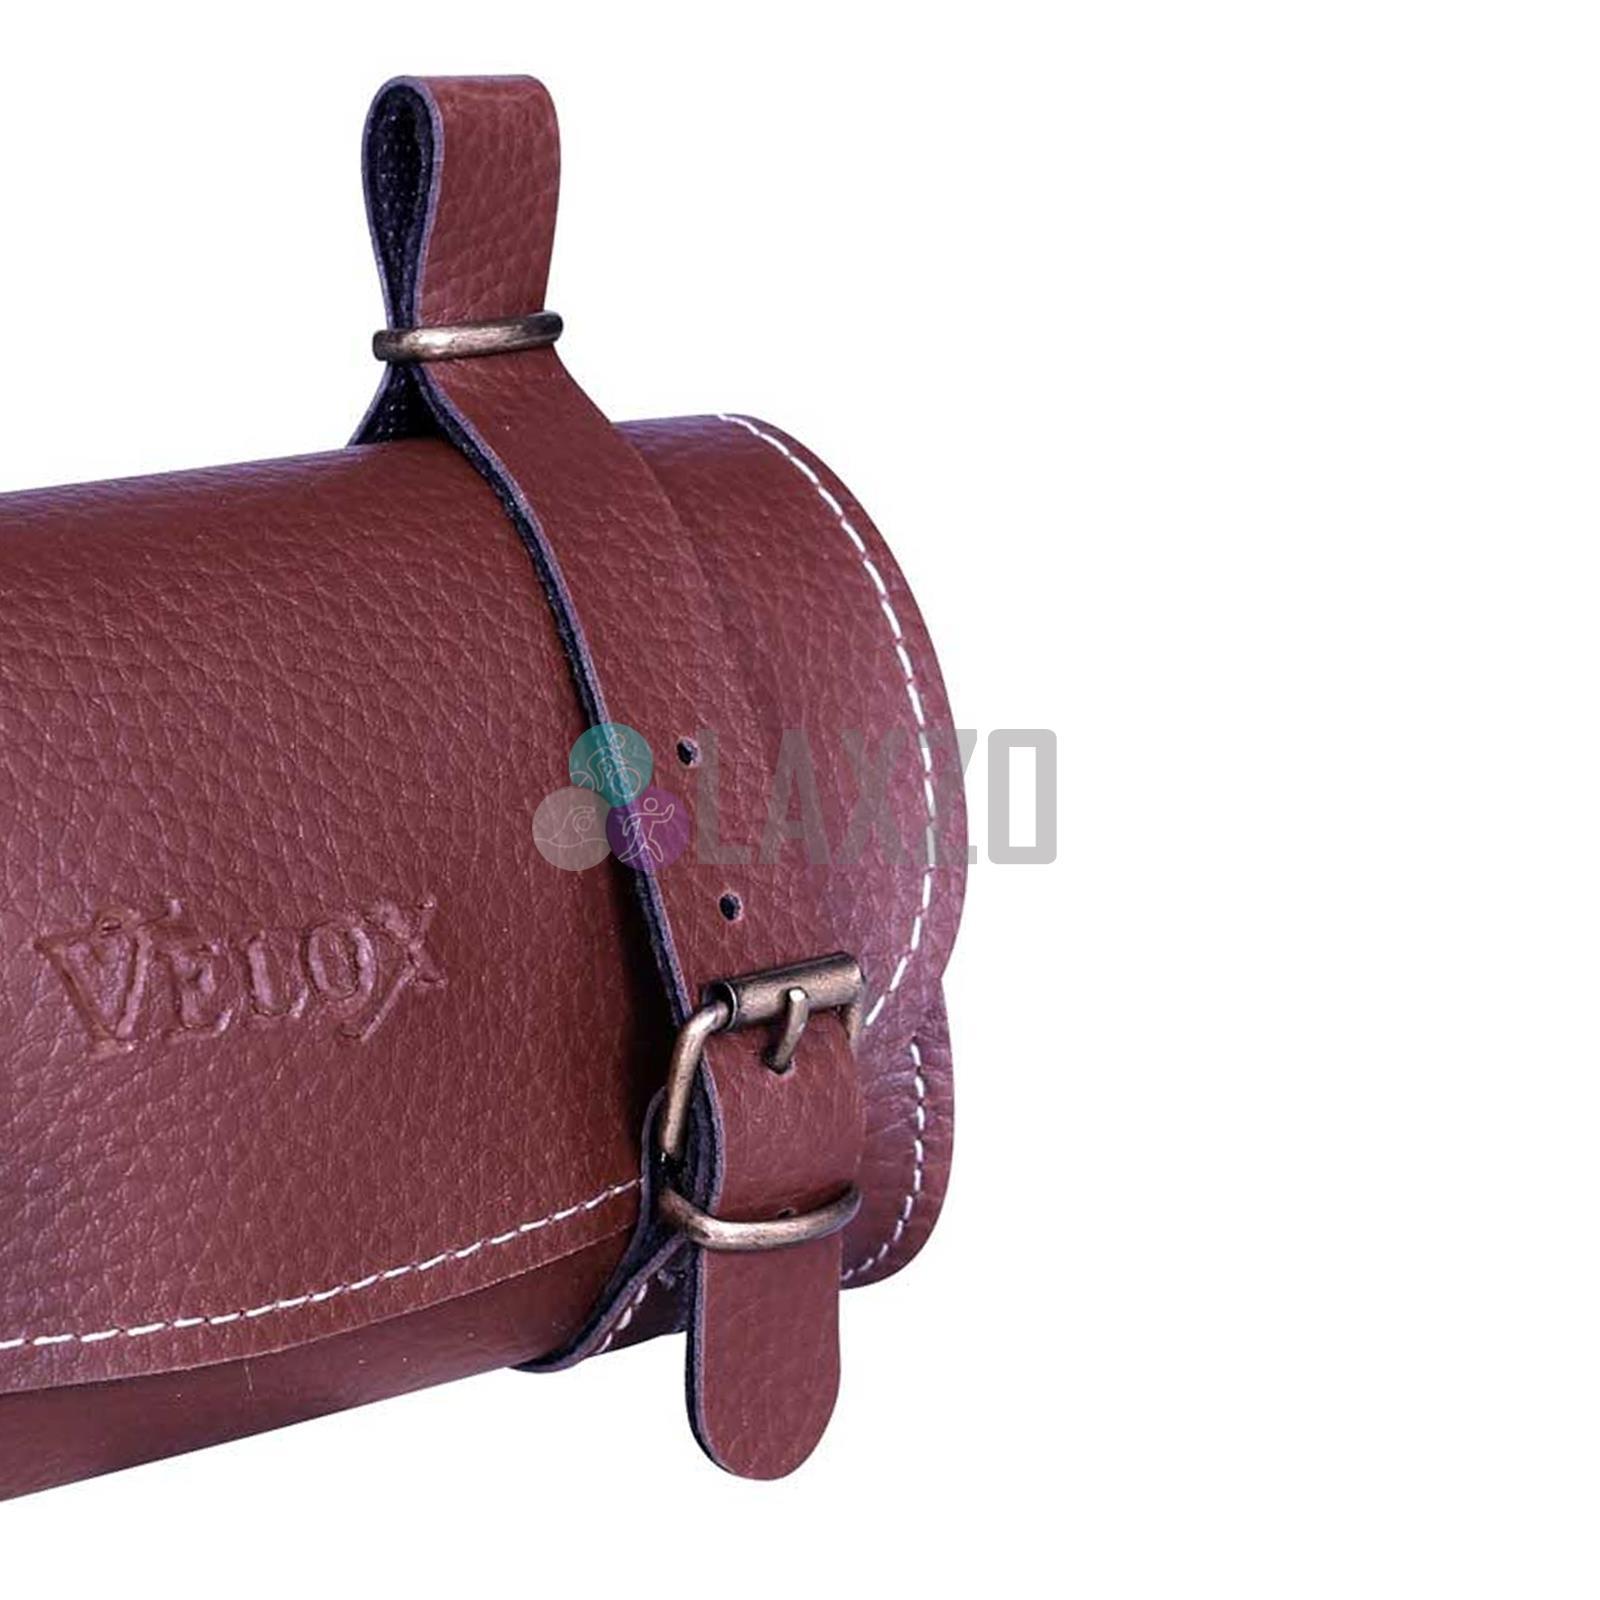 Black Velox Saddle Bag Classic Faux Leather 17cm X 10cm X 5cm Bags Panniers Sporting Goods